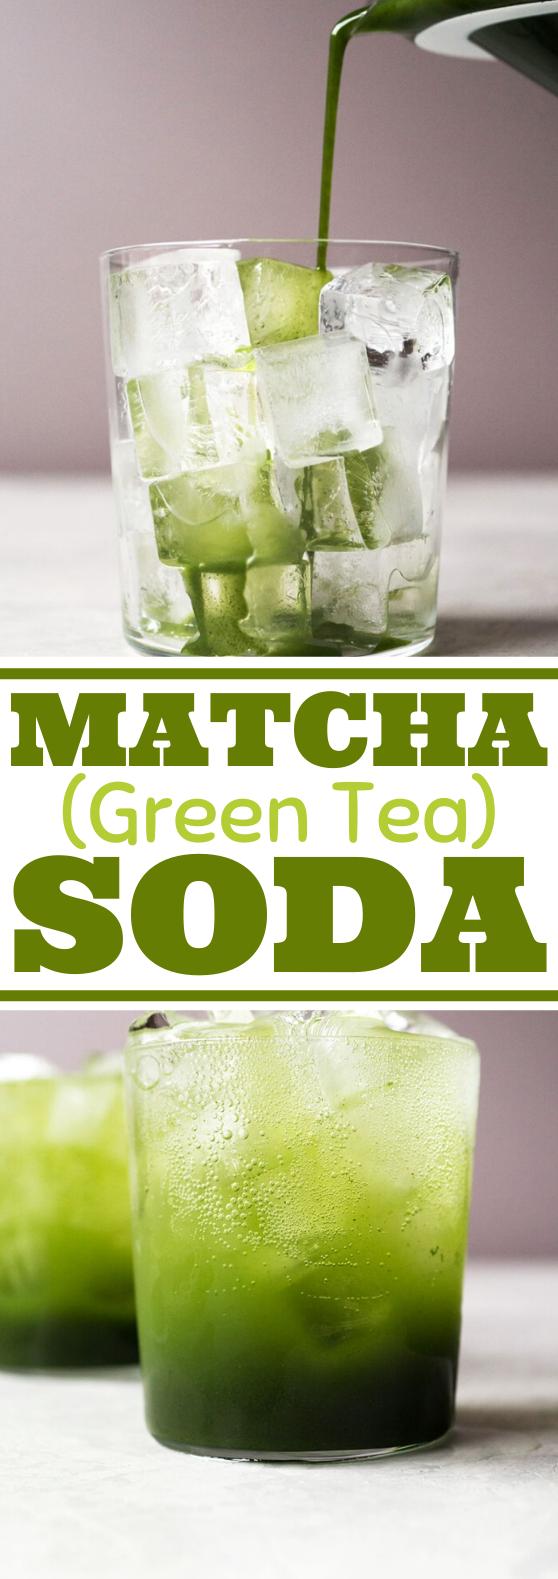 Matcha (Green Tea) Soda #drinks #recipe #nonalcohol #soda #greentea